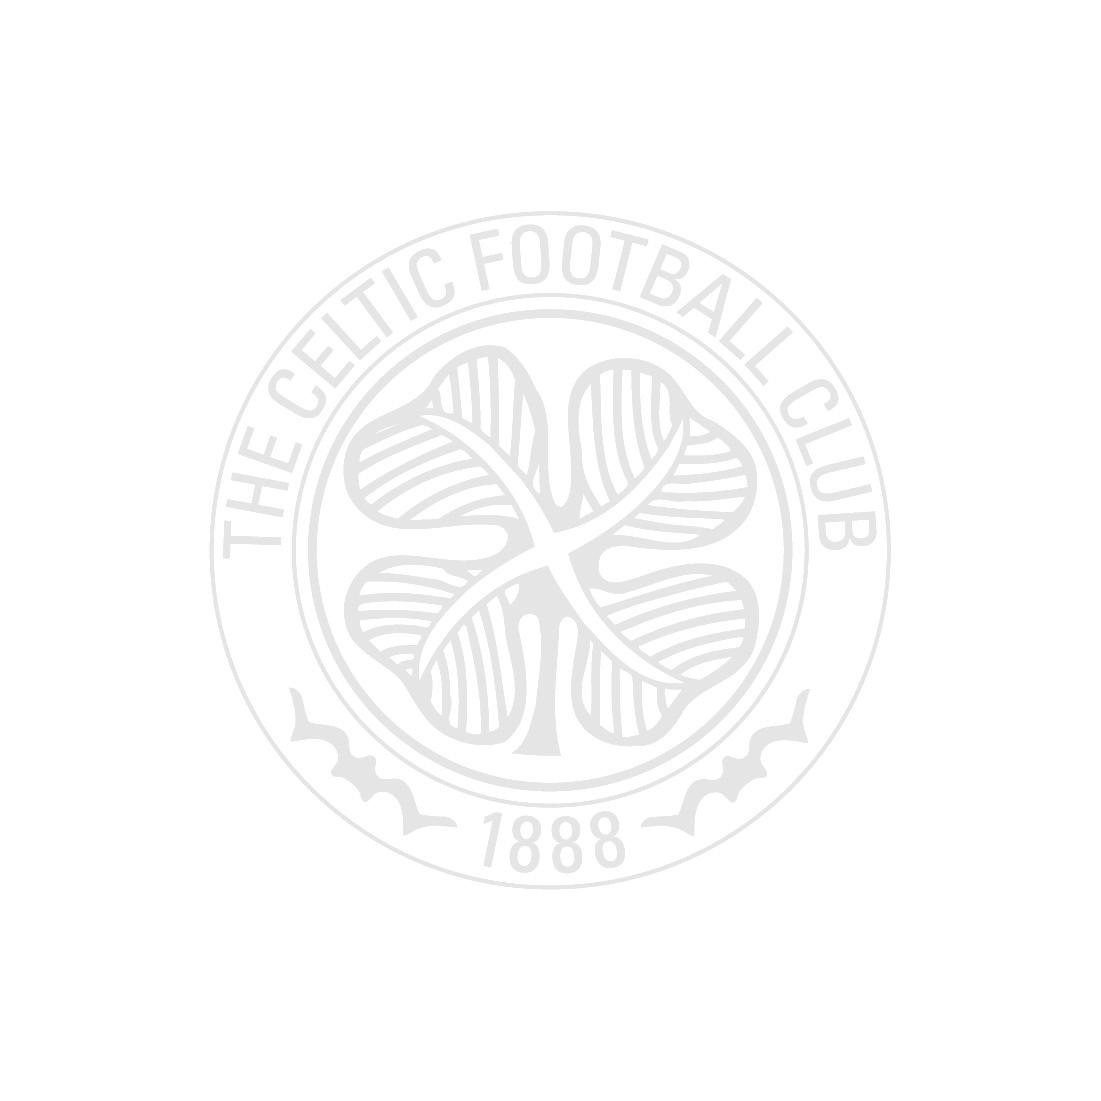 Celtic Mens Home Shirt 18/19 with Sponsor